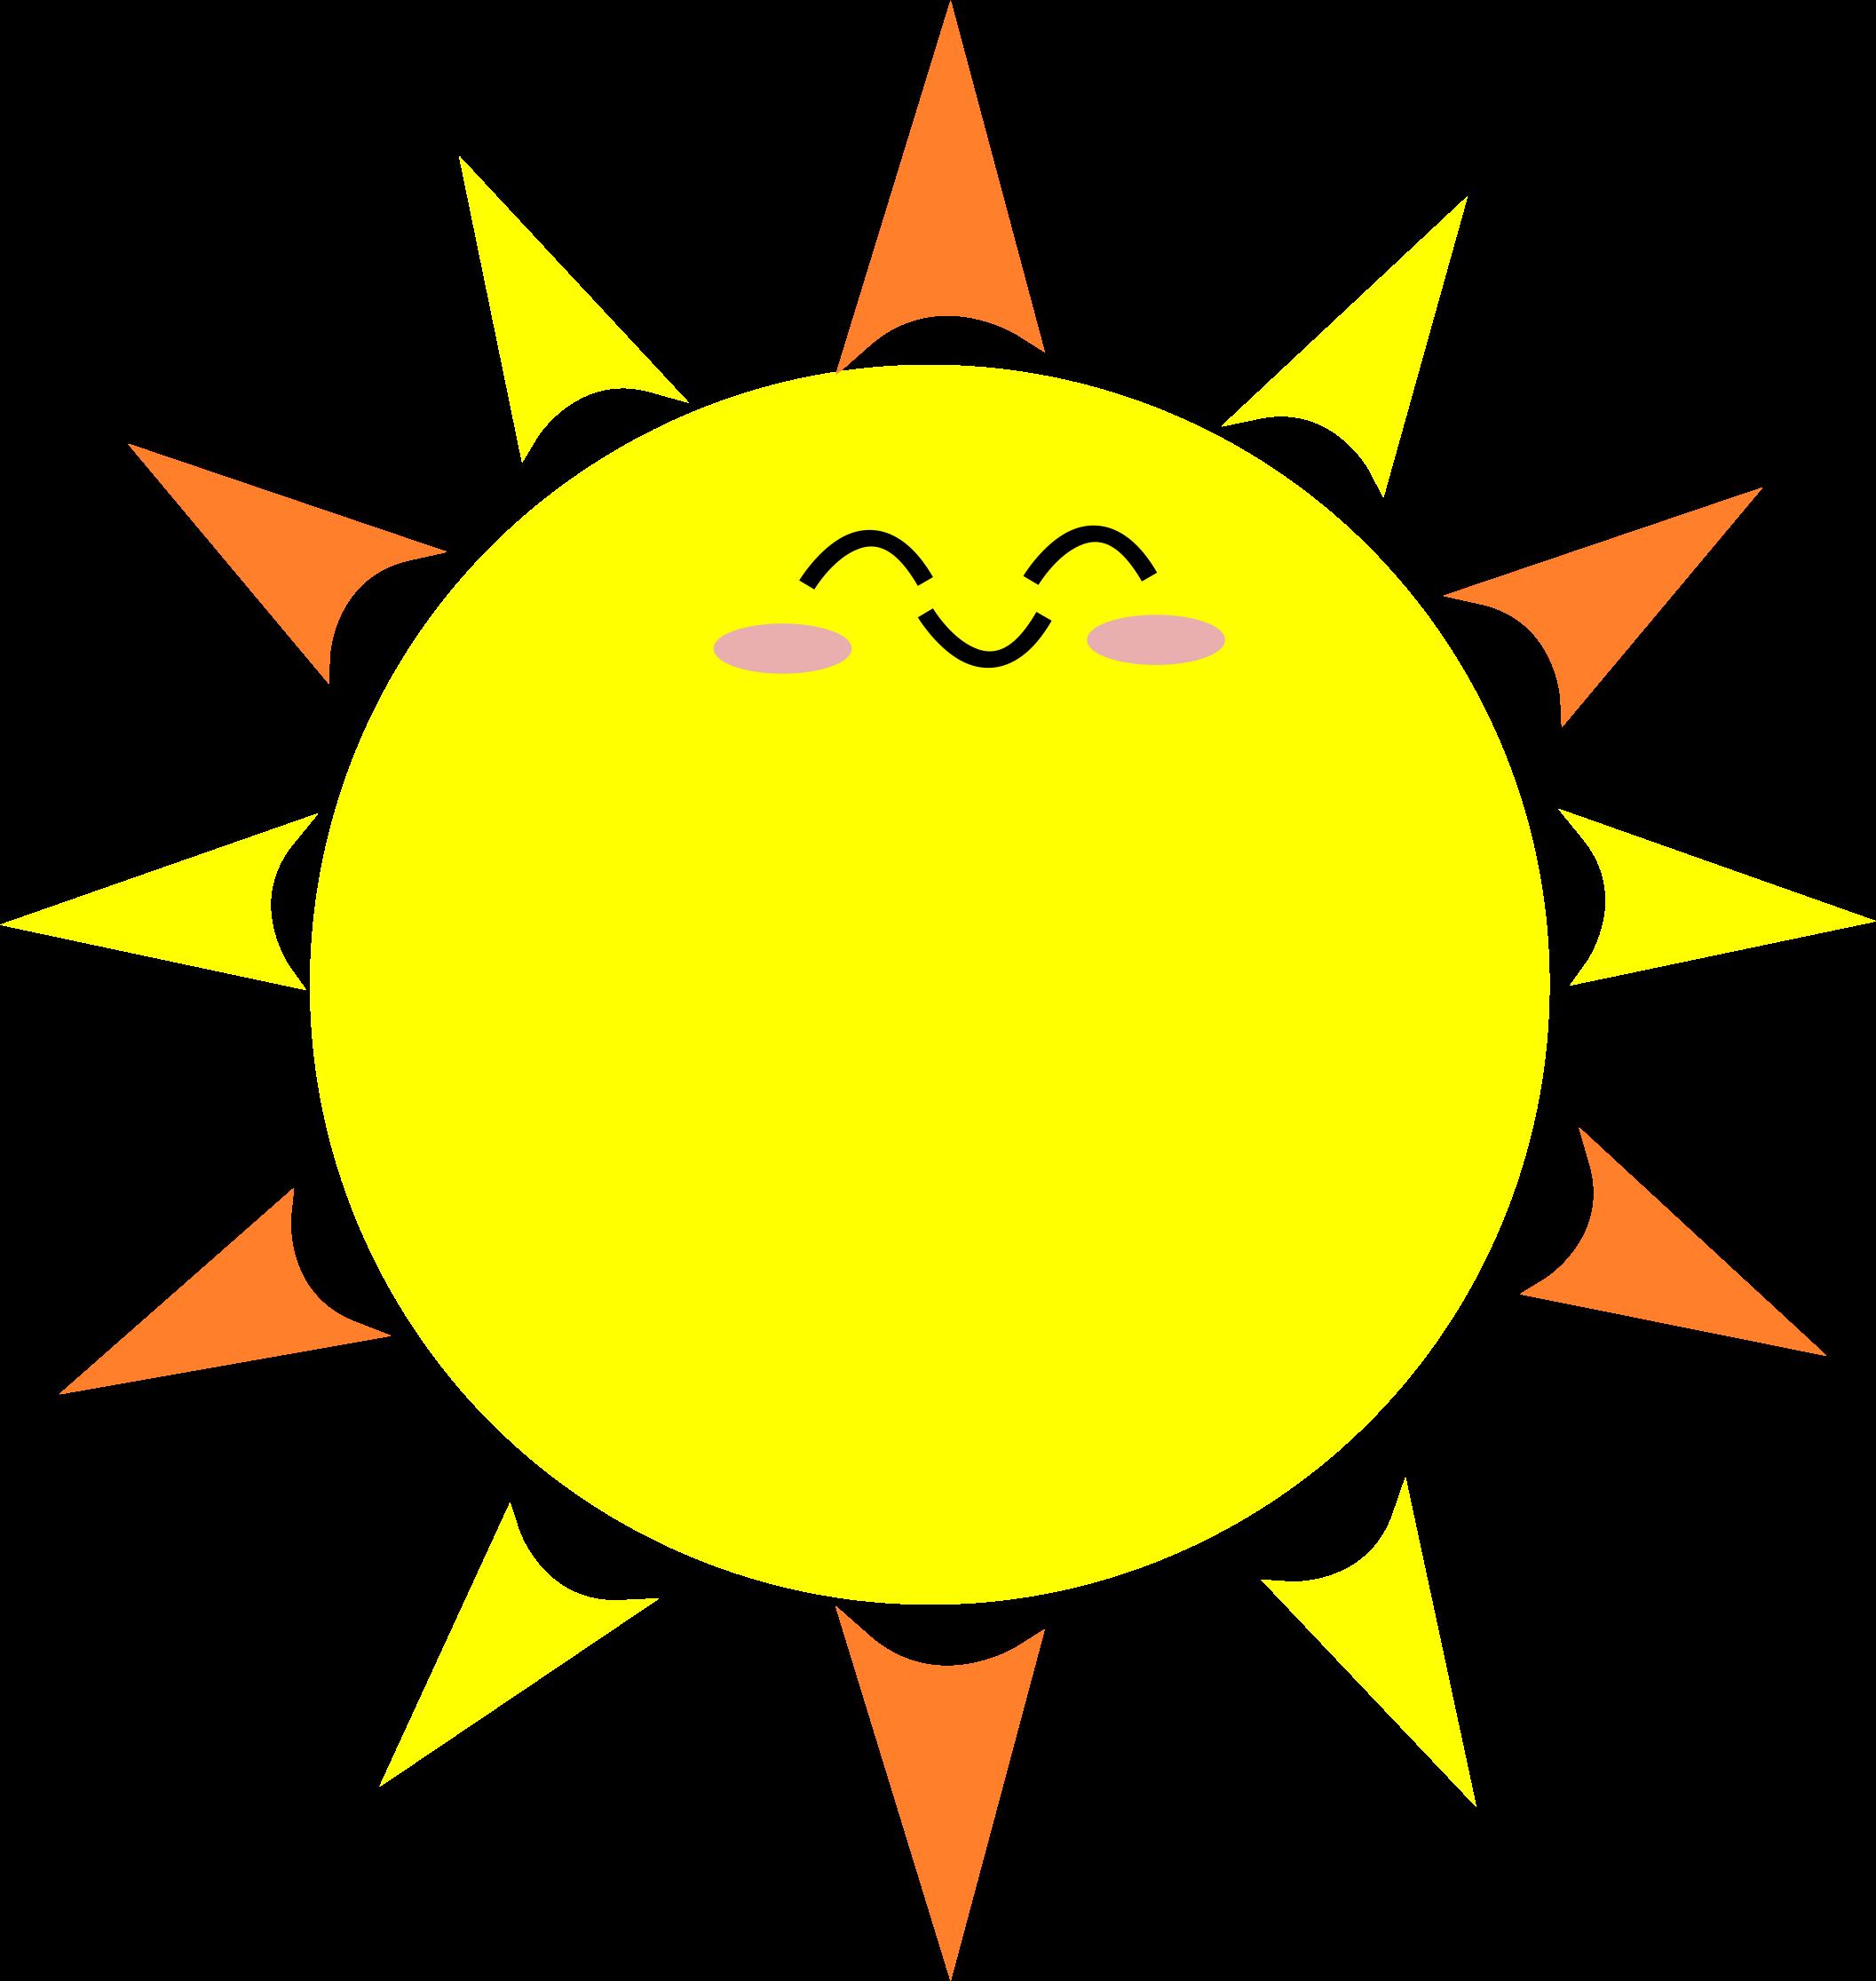 Happy big image png. Cute clipart sun